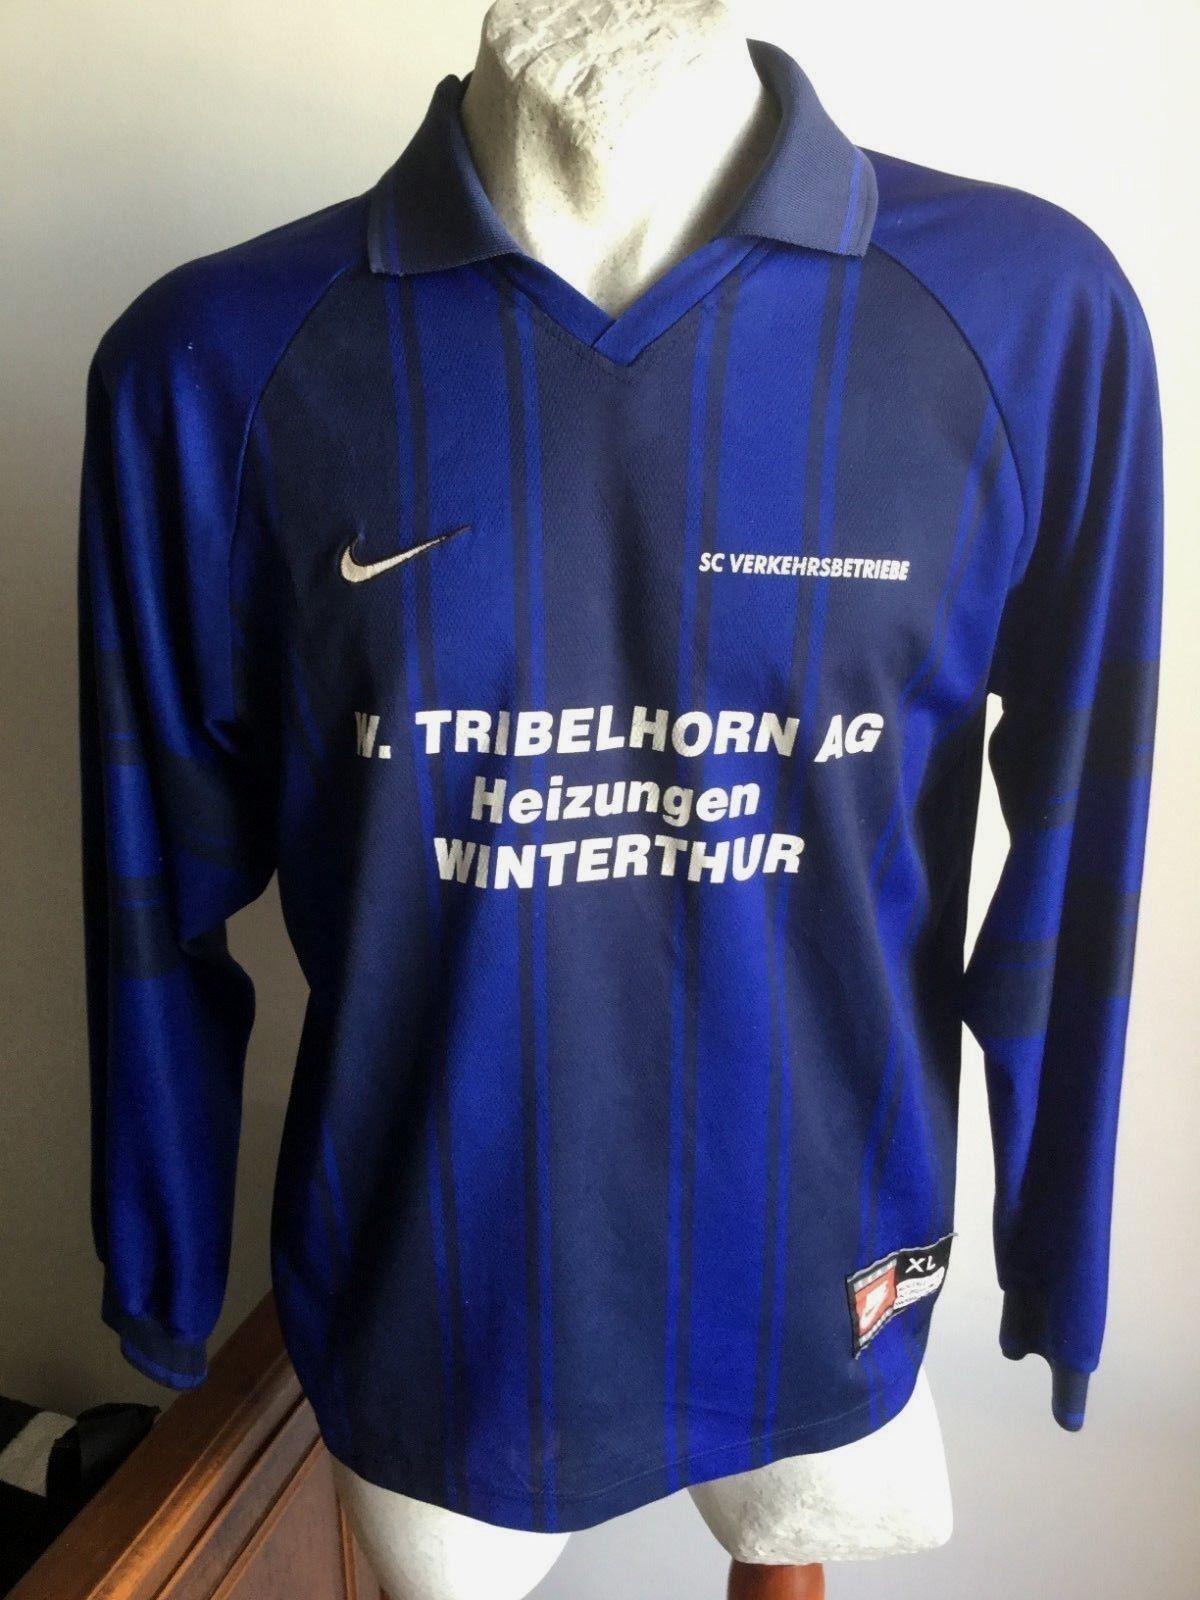 Maglia calcio nike sc verkehrsbetriebe bern swiss football shirt jersey size XL